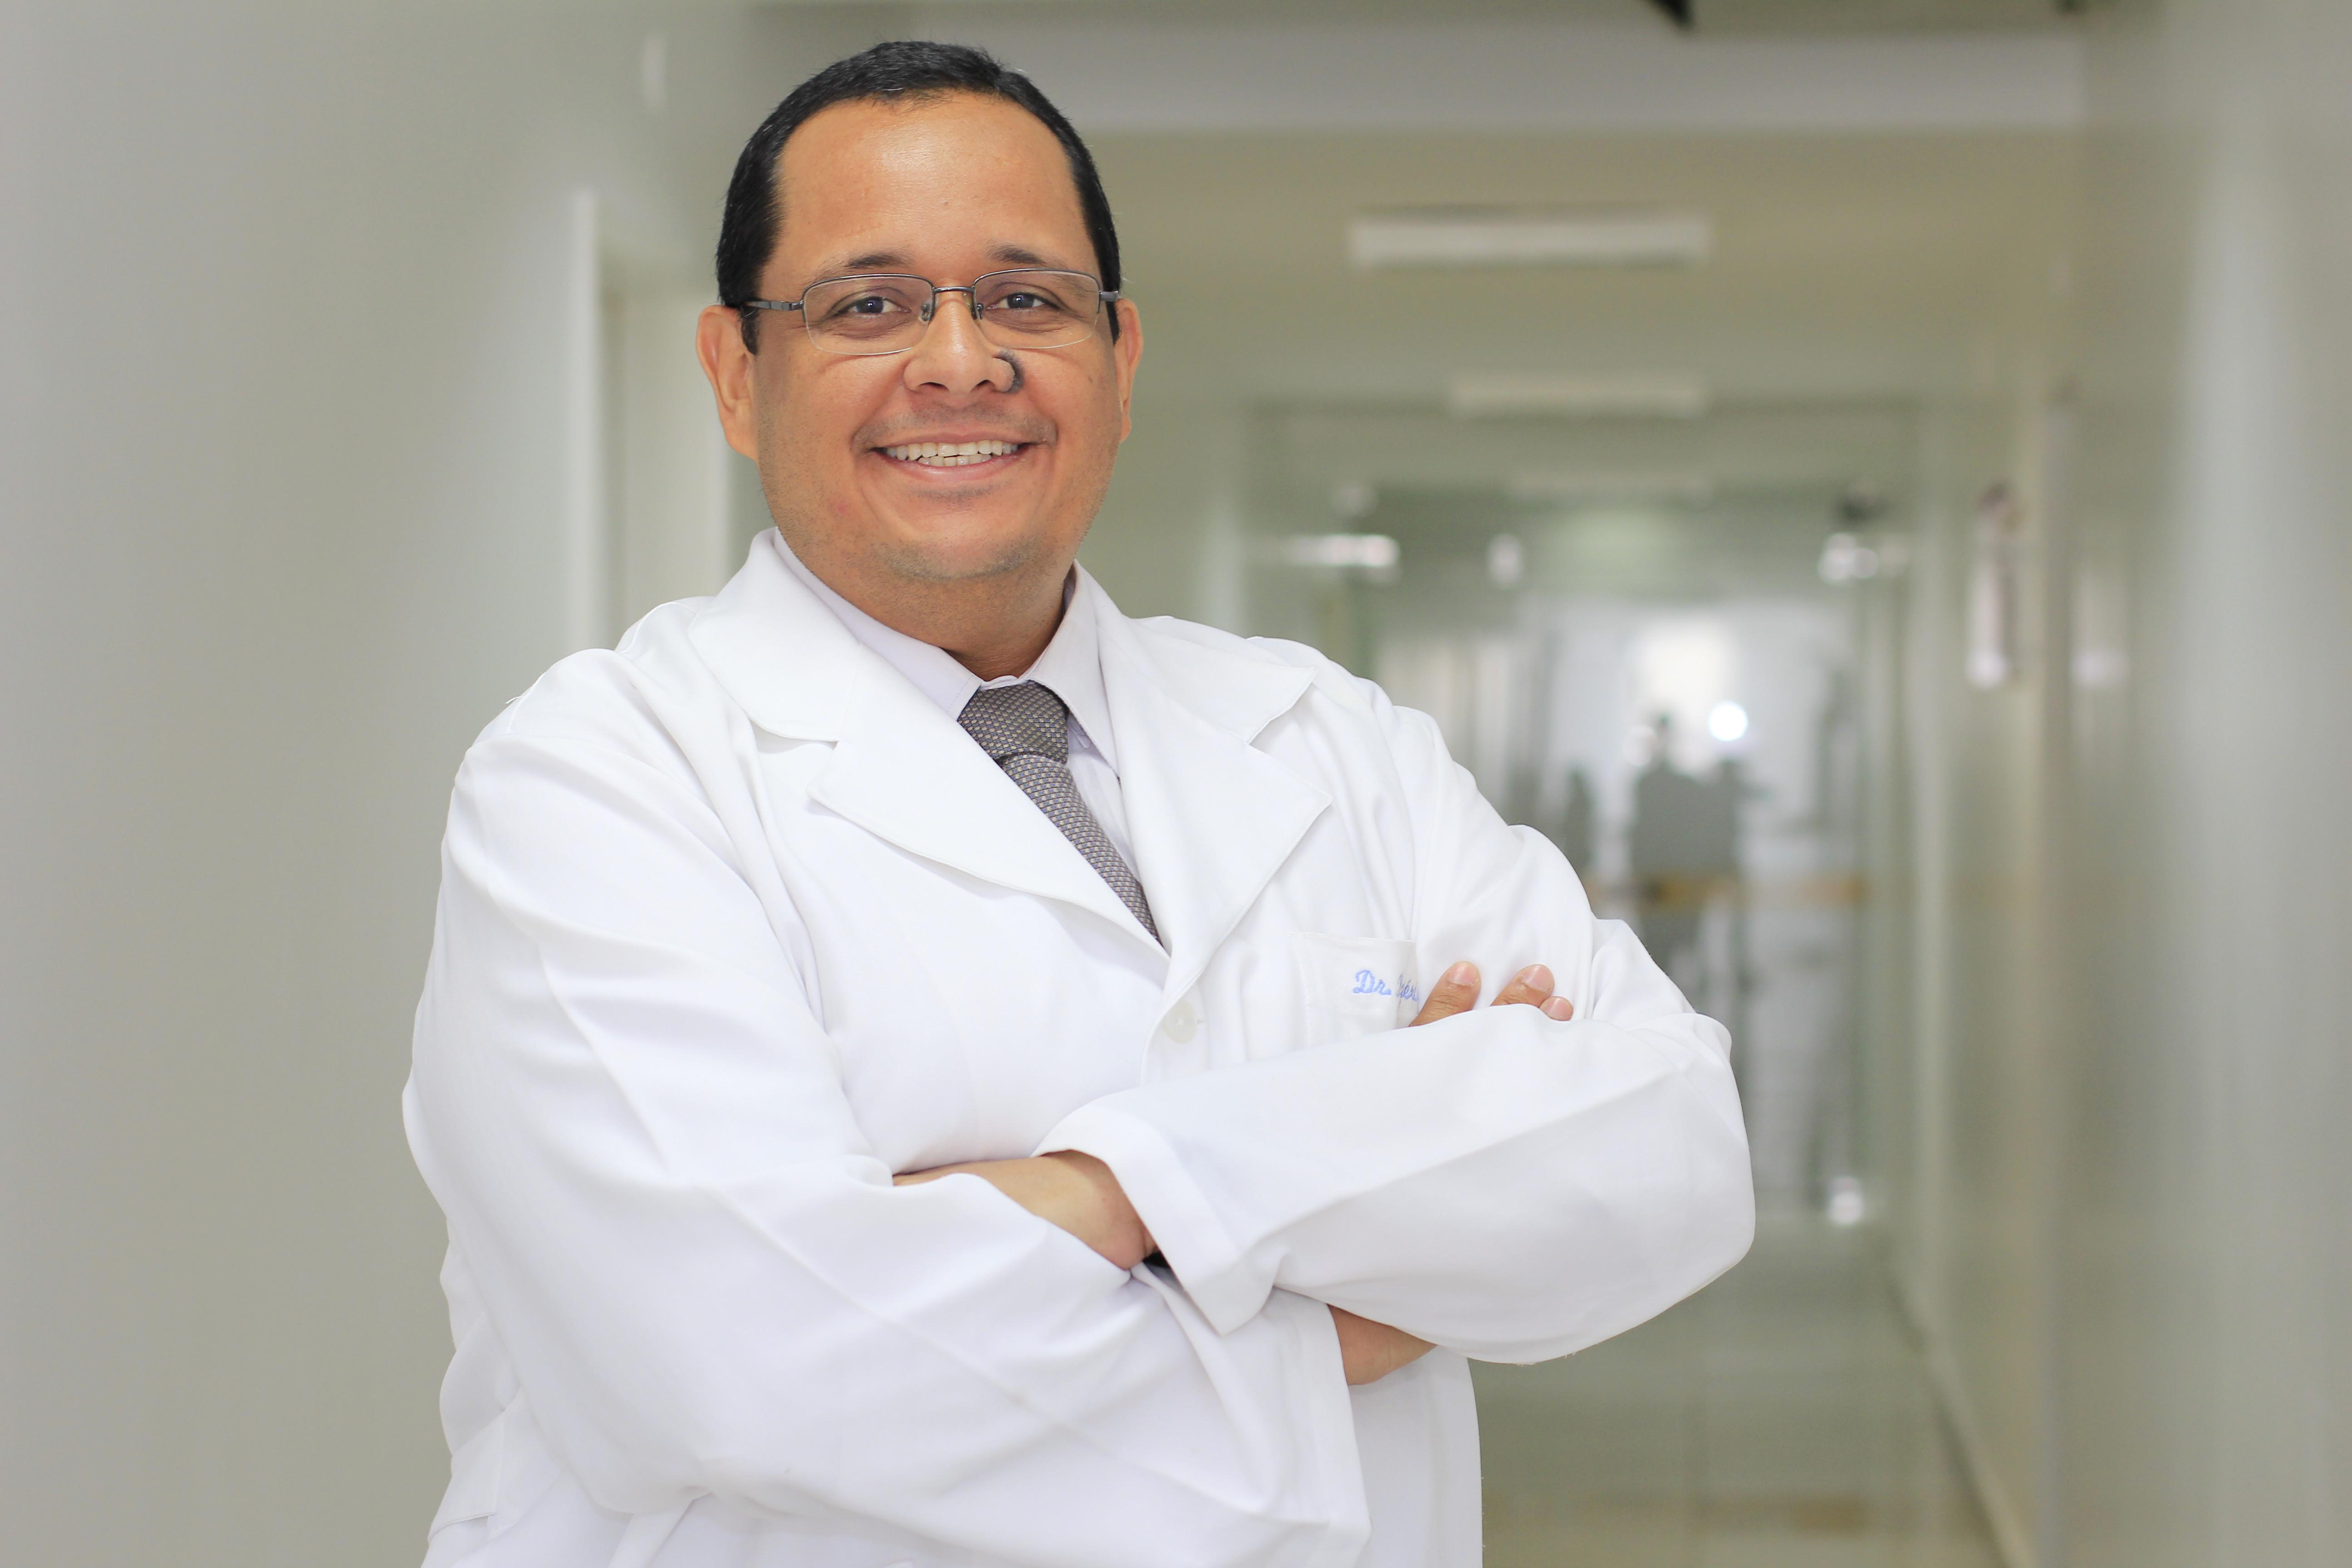 Consulta Dr. Rogério Bernardo